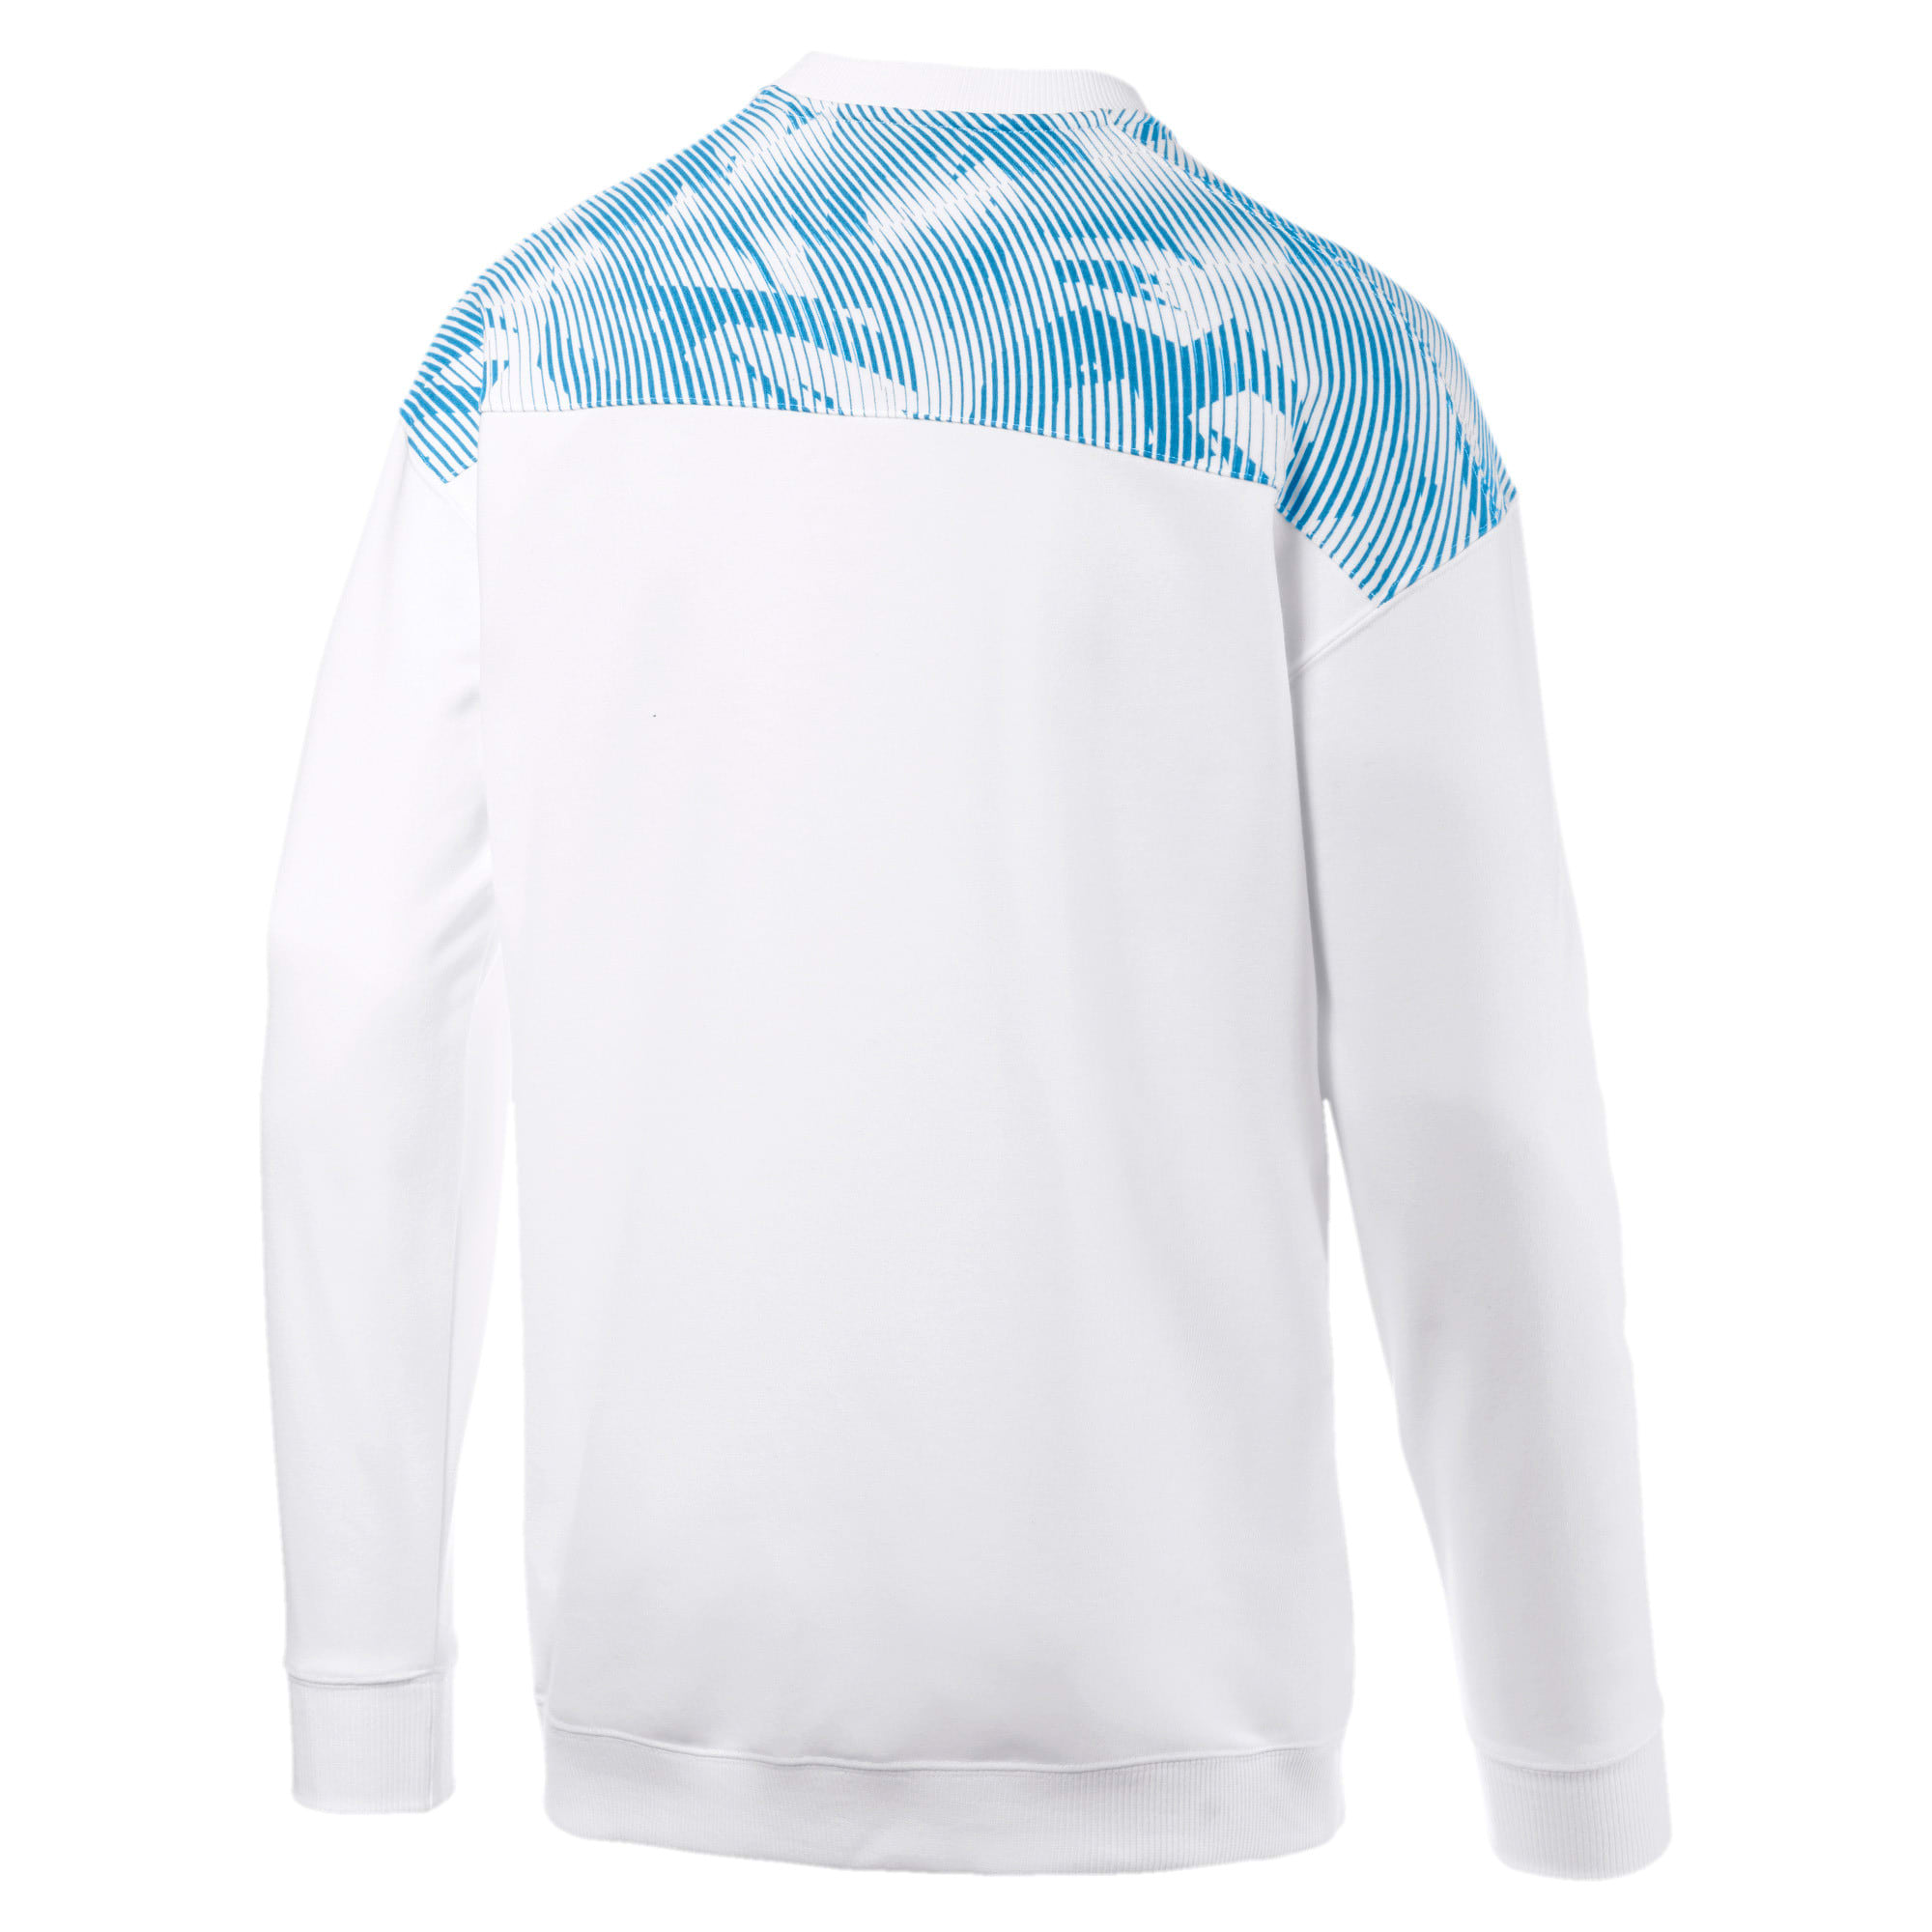 Thumbnail 5 of Olympique de Marseille Casuals Men's Sweater, Puma White-Bleu Azur, medium